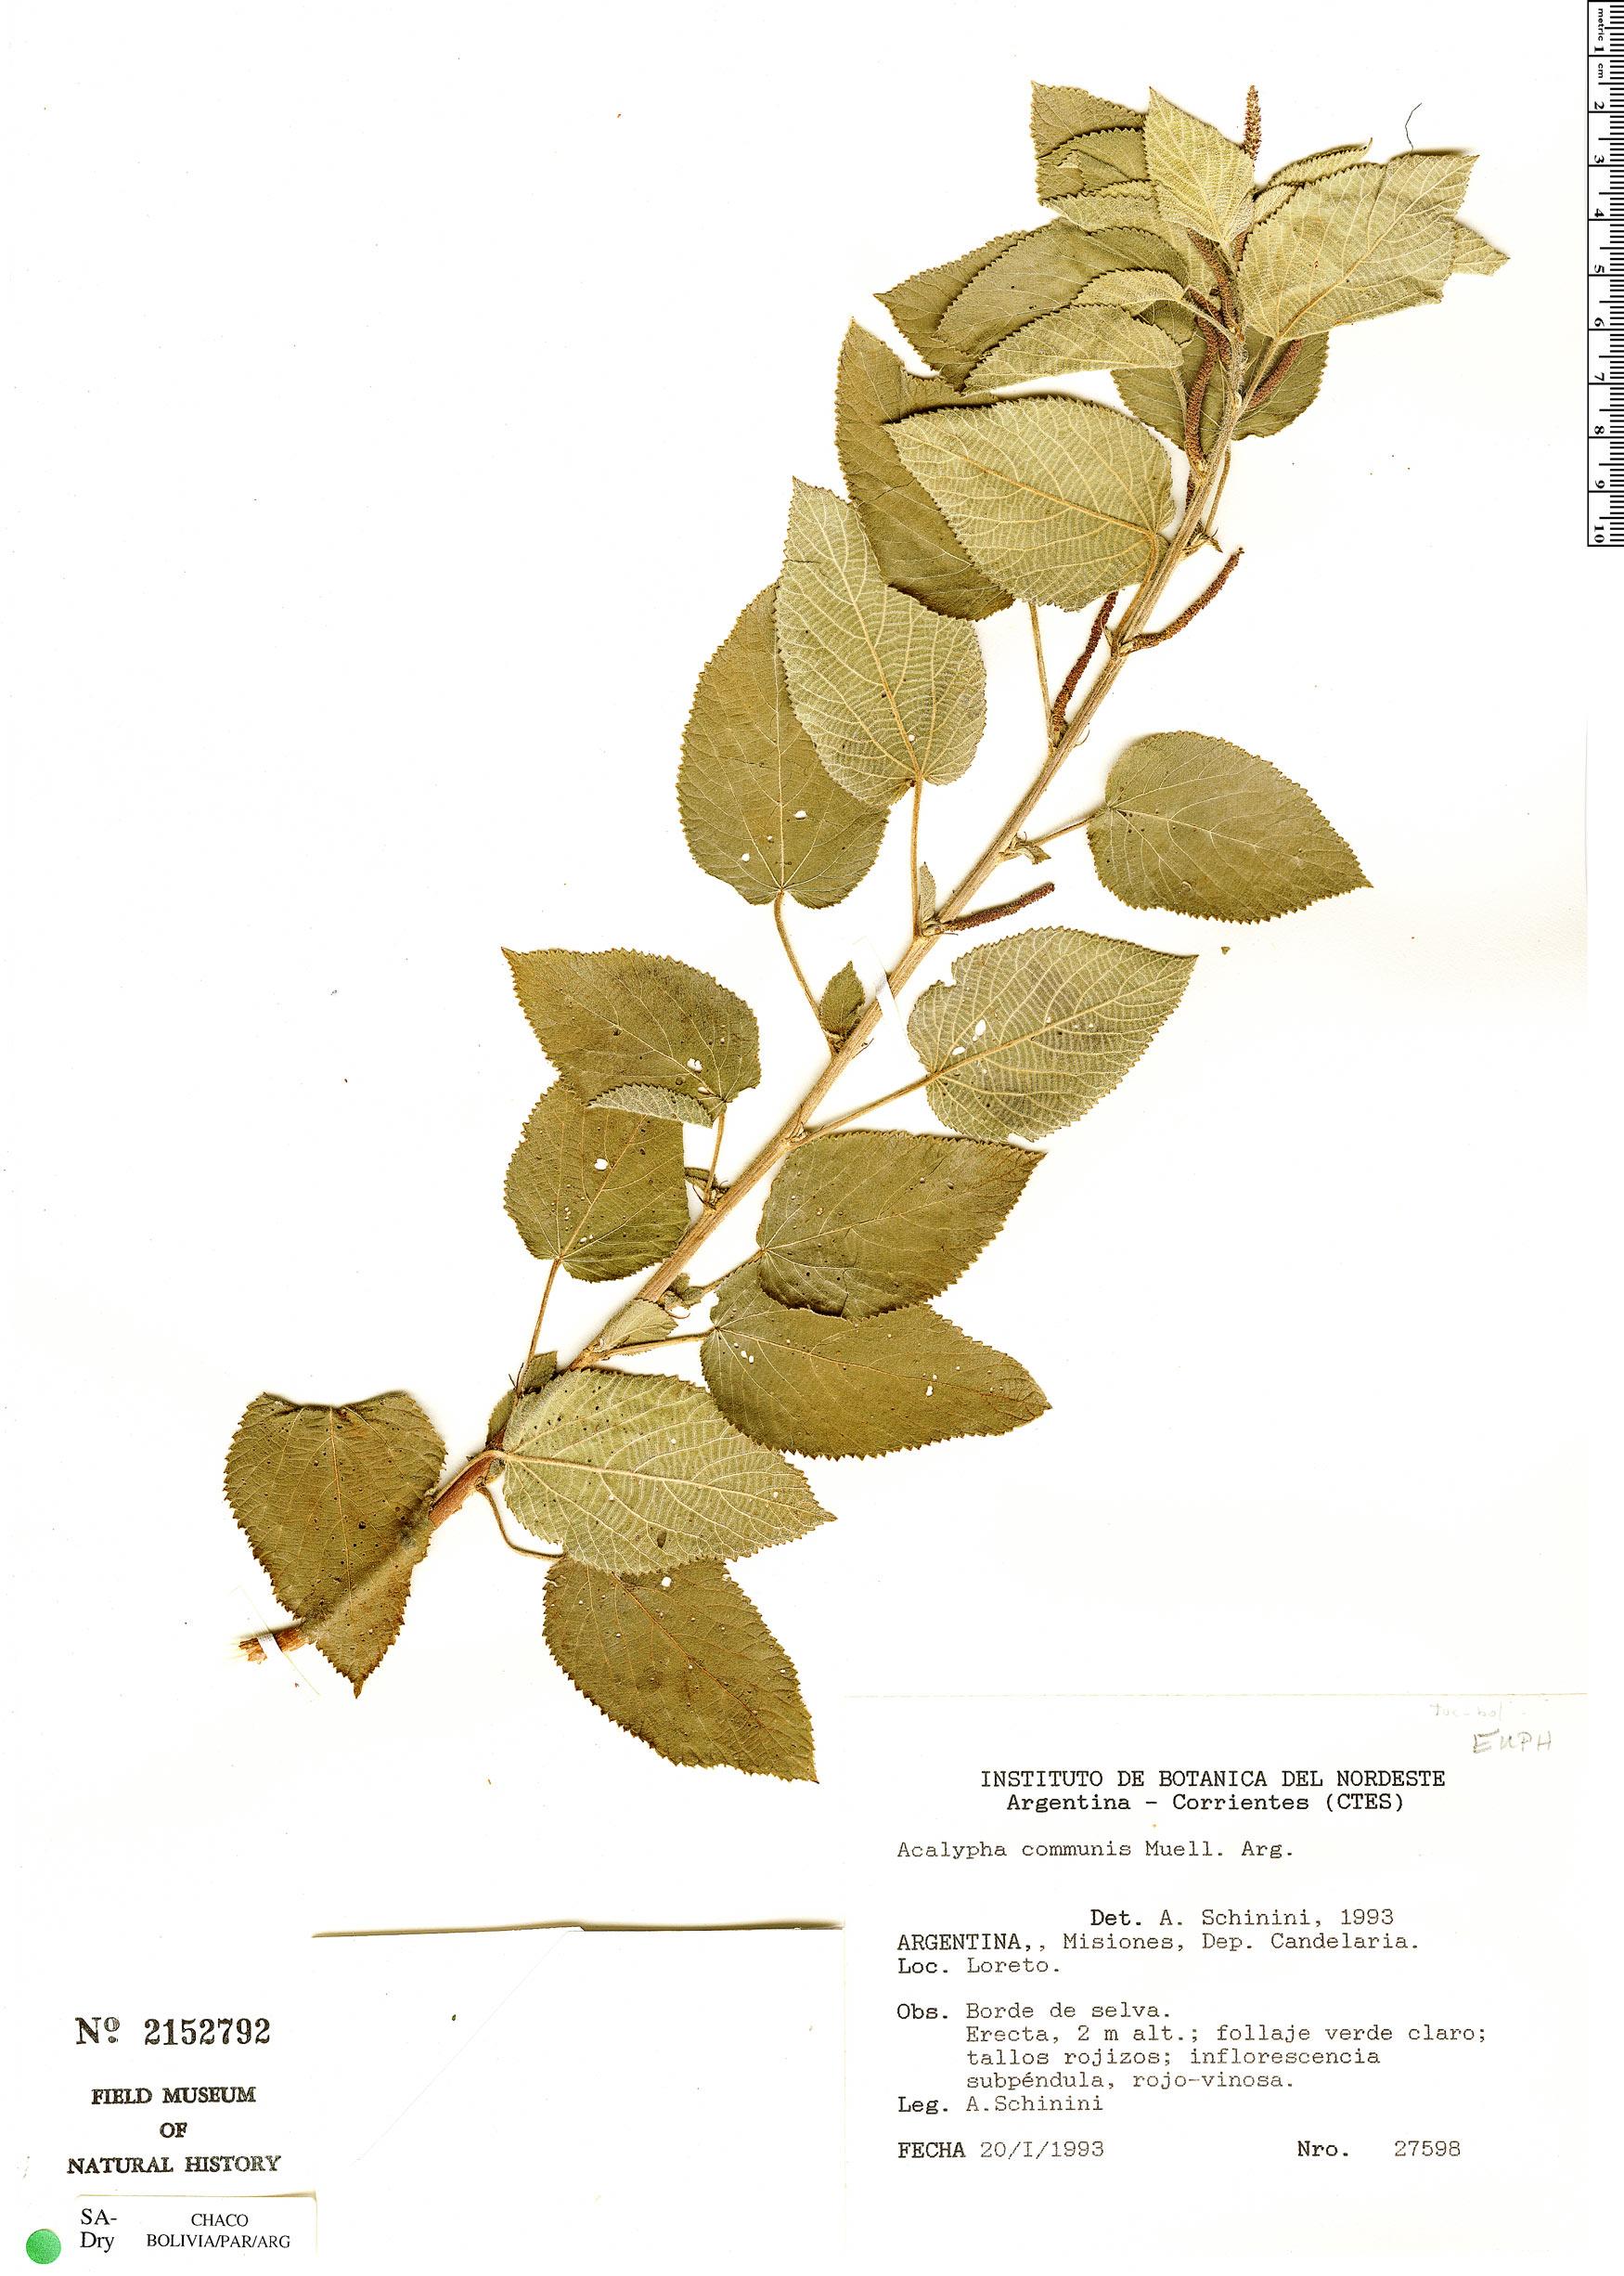 Specimen: Acalypha communis